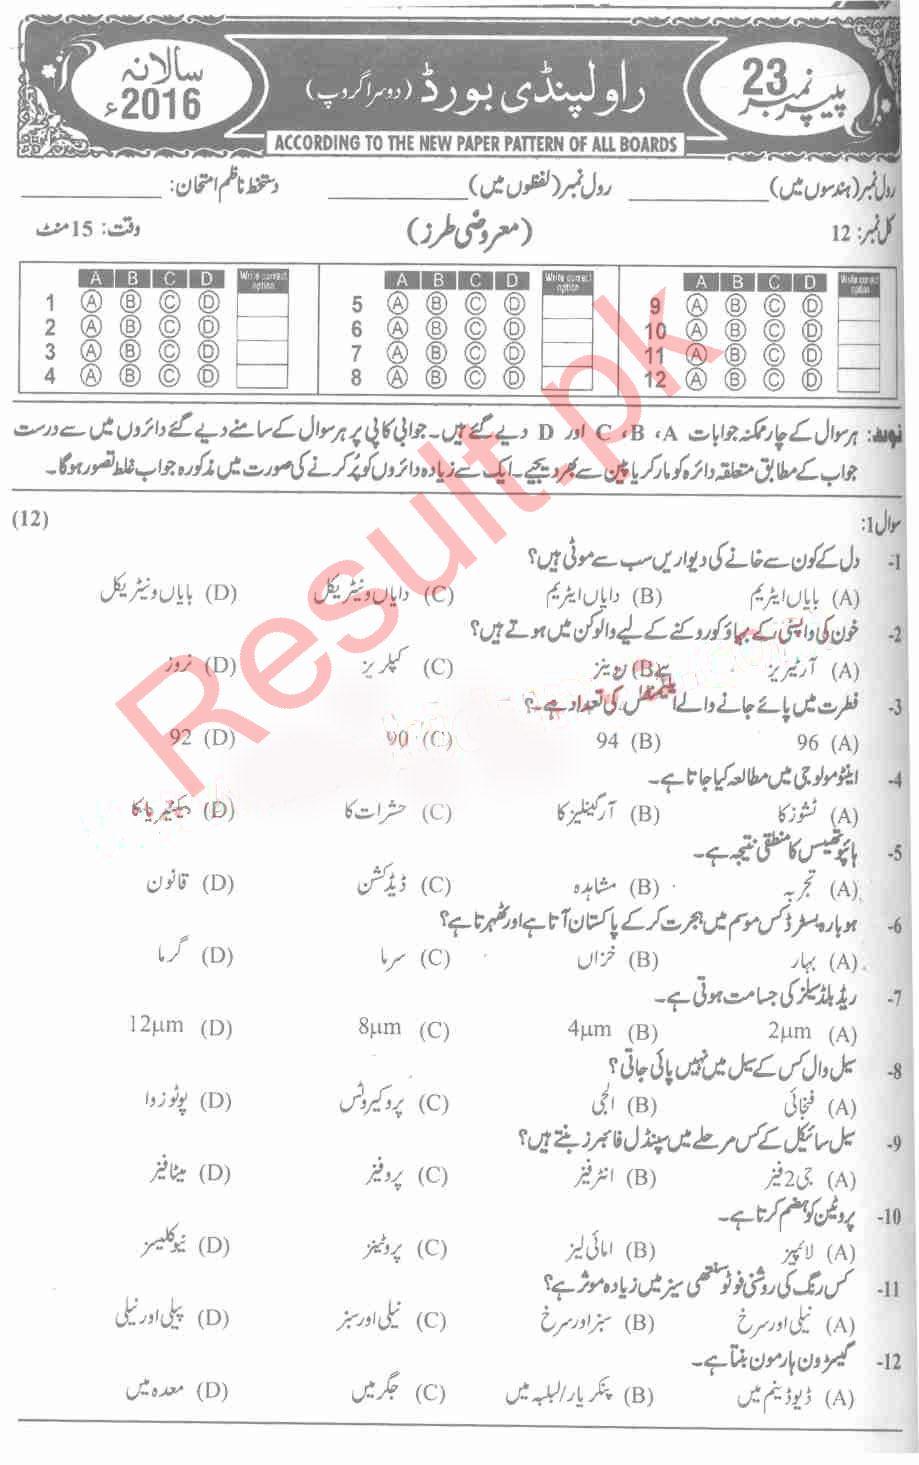 BISE Rawalpindi Board Past Papers 2019 Matric, SSC Part 1